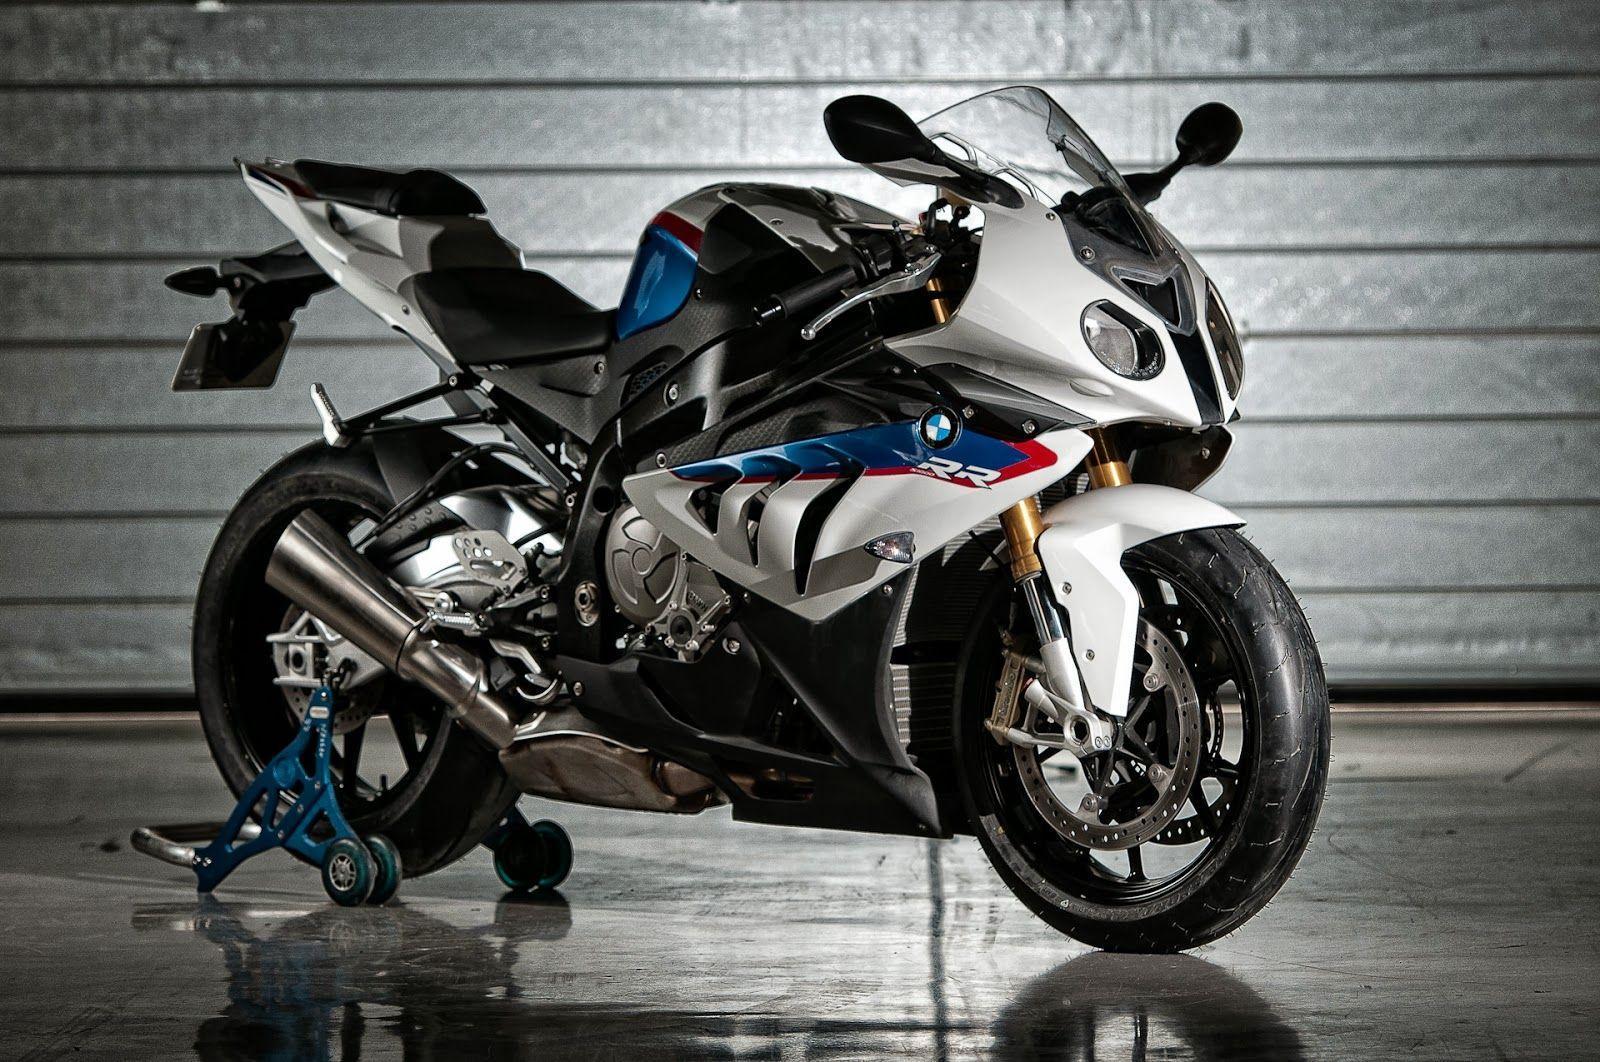 Superbike Hd Wallpaper Full Screen: BMW S1000RR Wallpapers